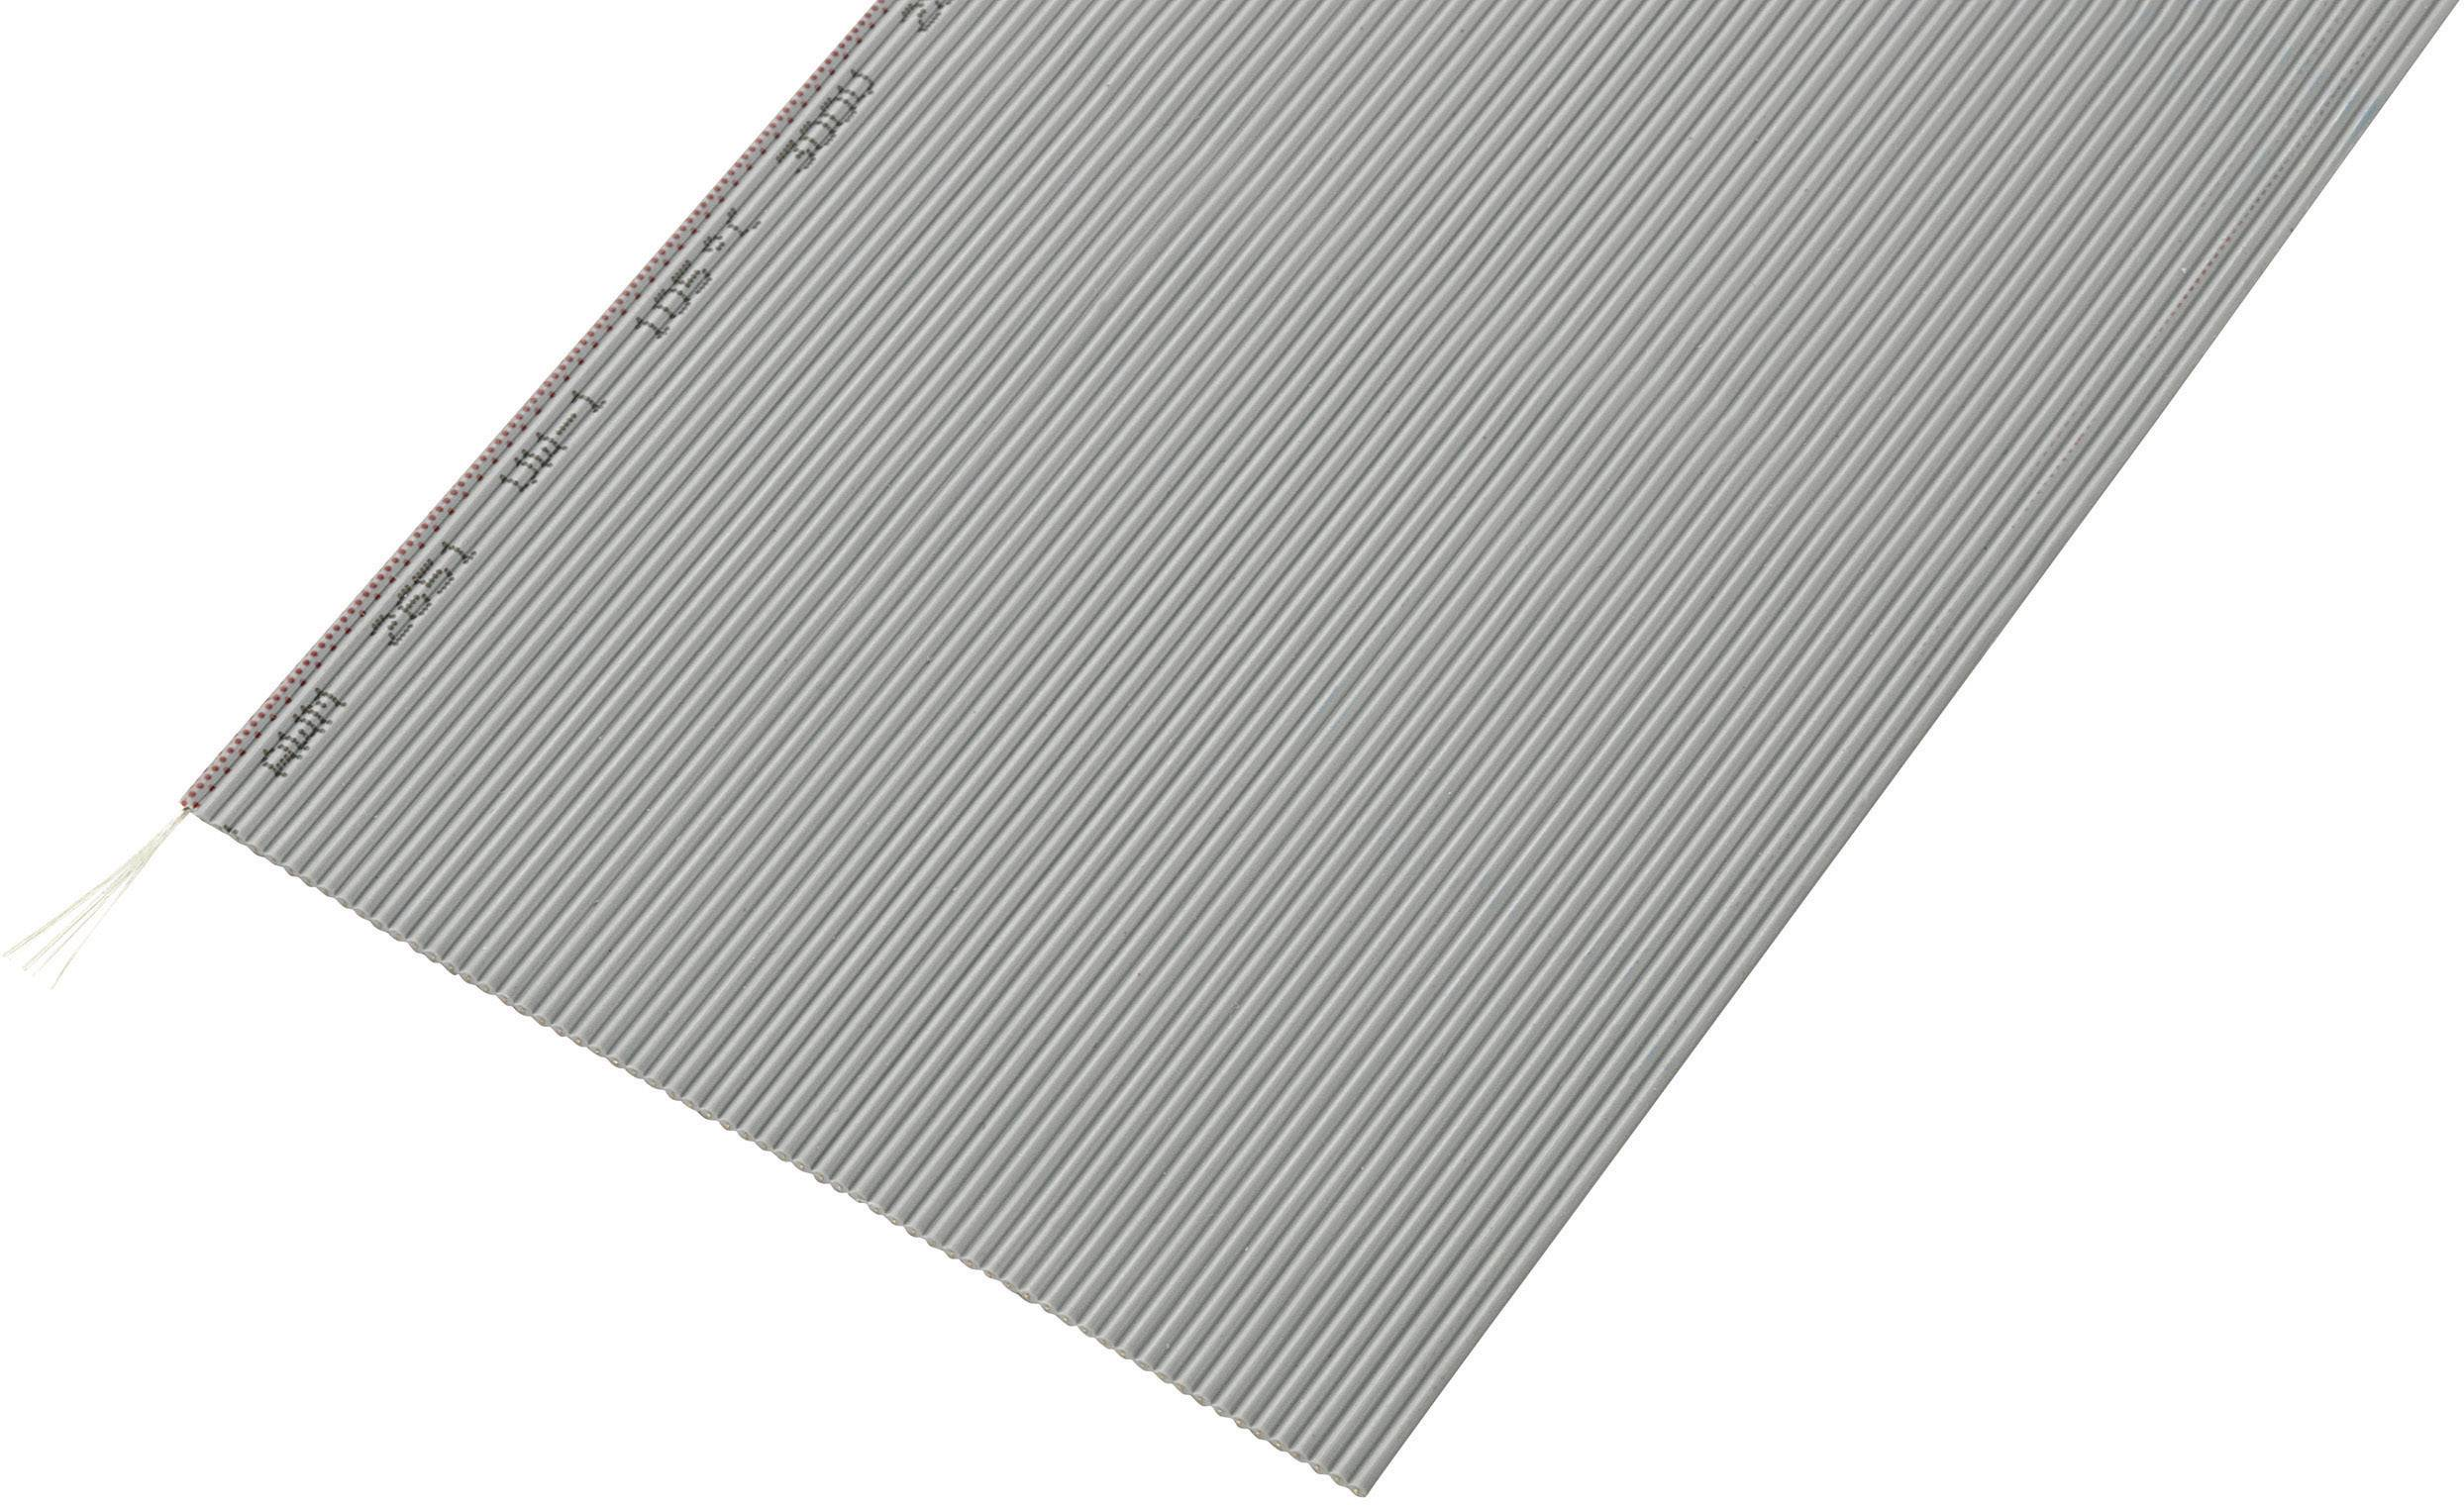 Plochý kabel Flachband cable 64P (SH1998C208), nestíněný, 30.5 m, šedá